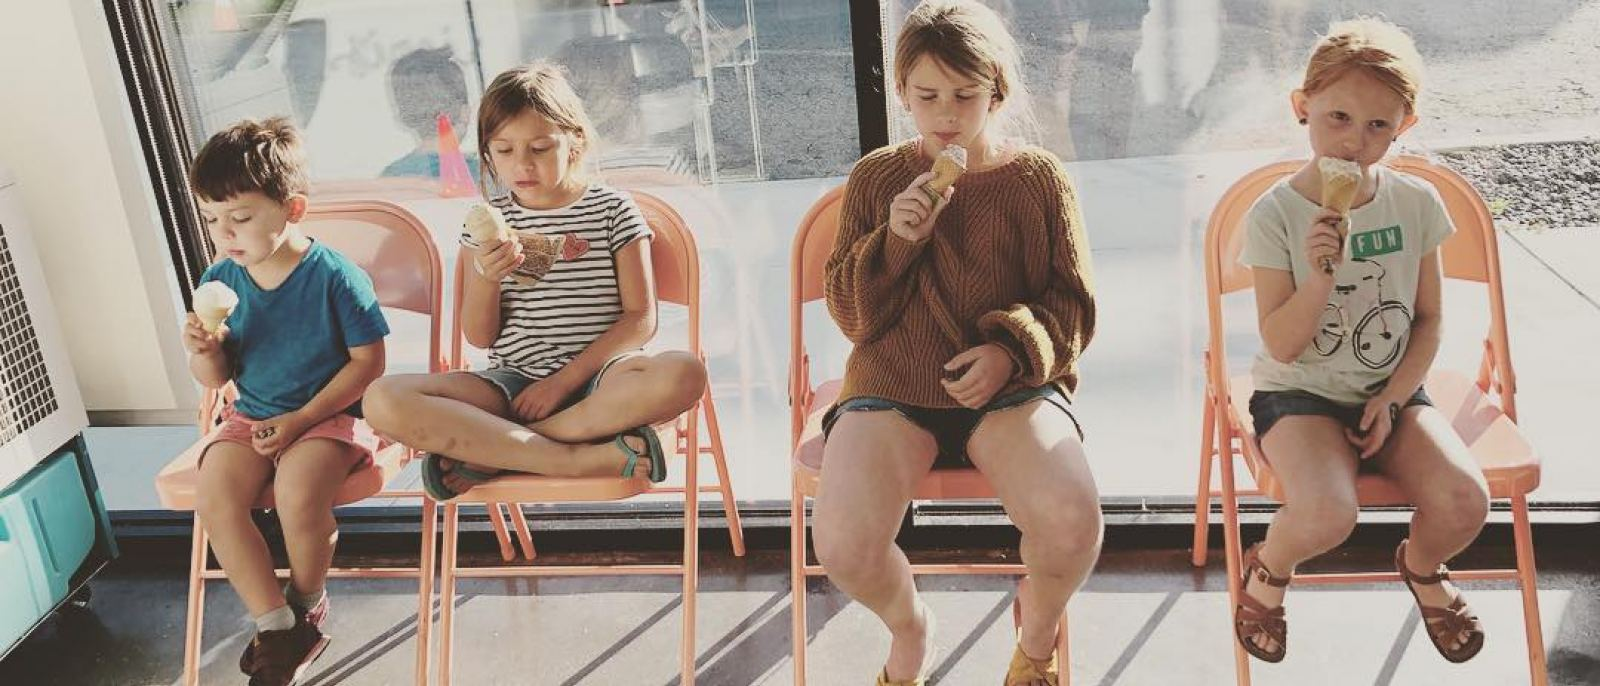 Kids enjoying Jeni's Splendid Ice Creams in Venice